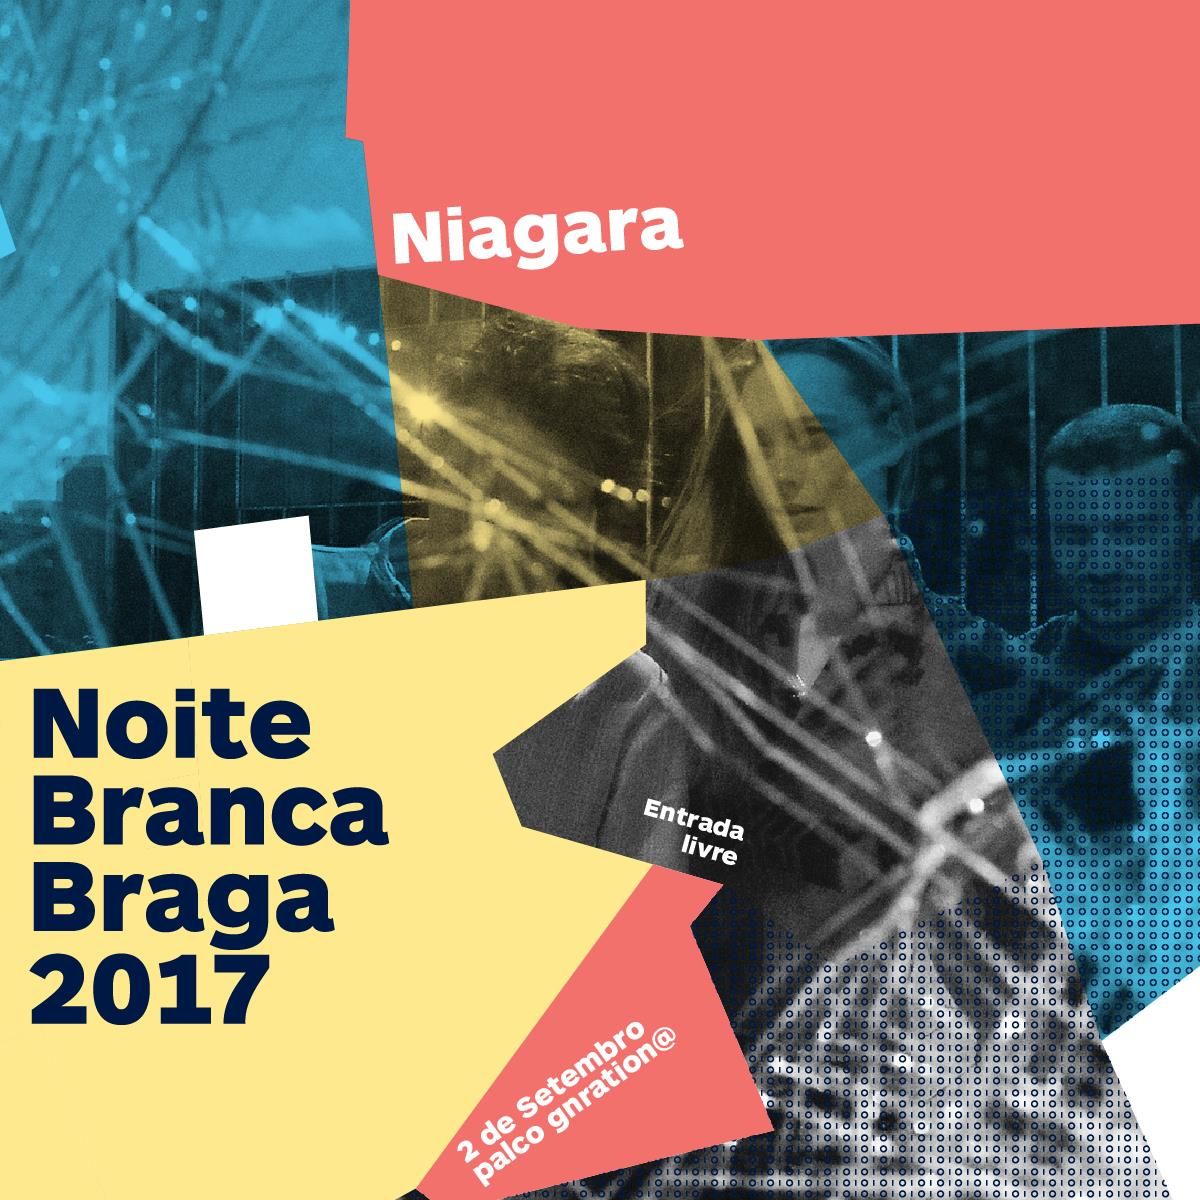 niagara-we-braga-noite-branca